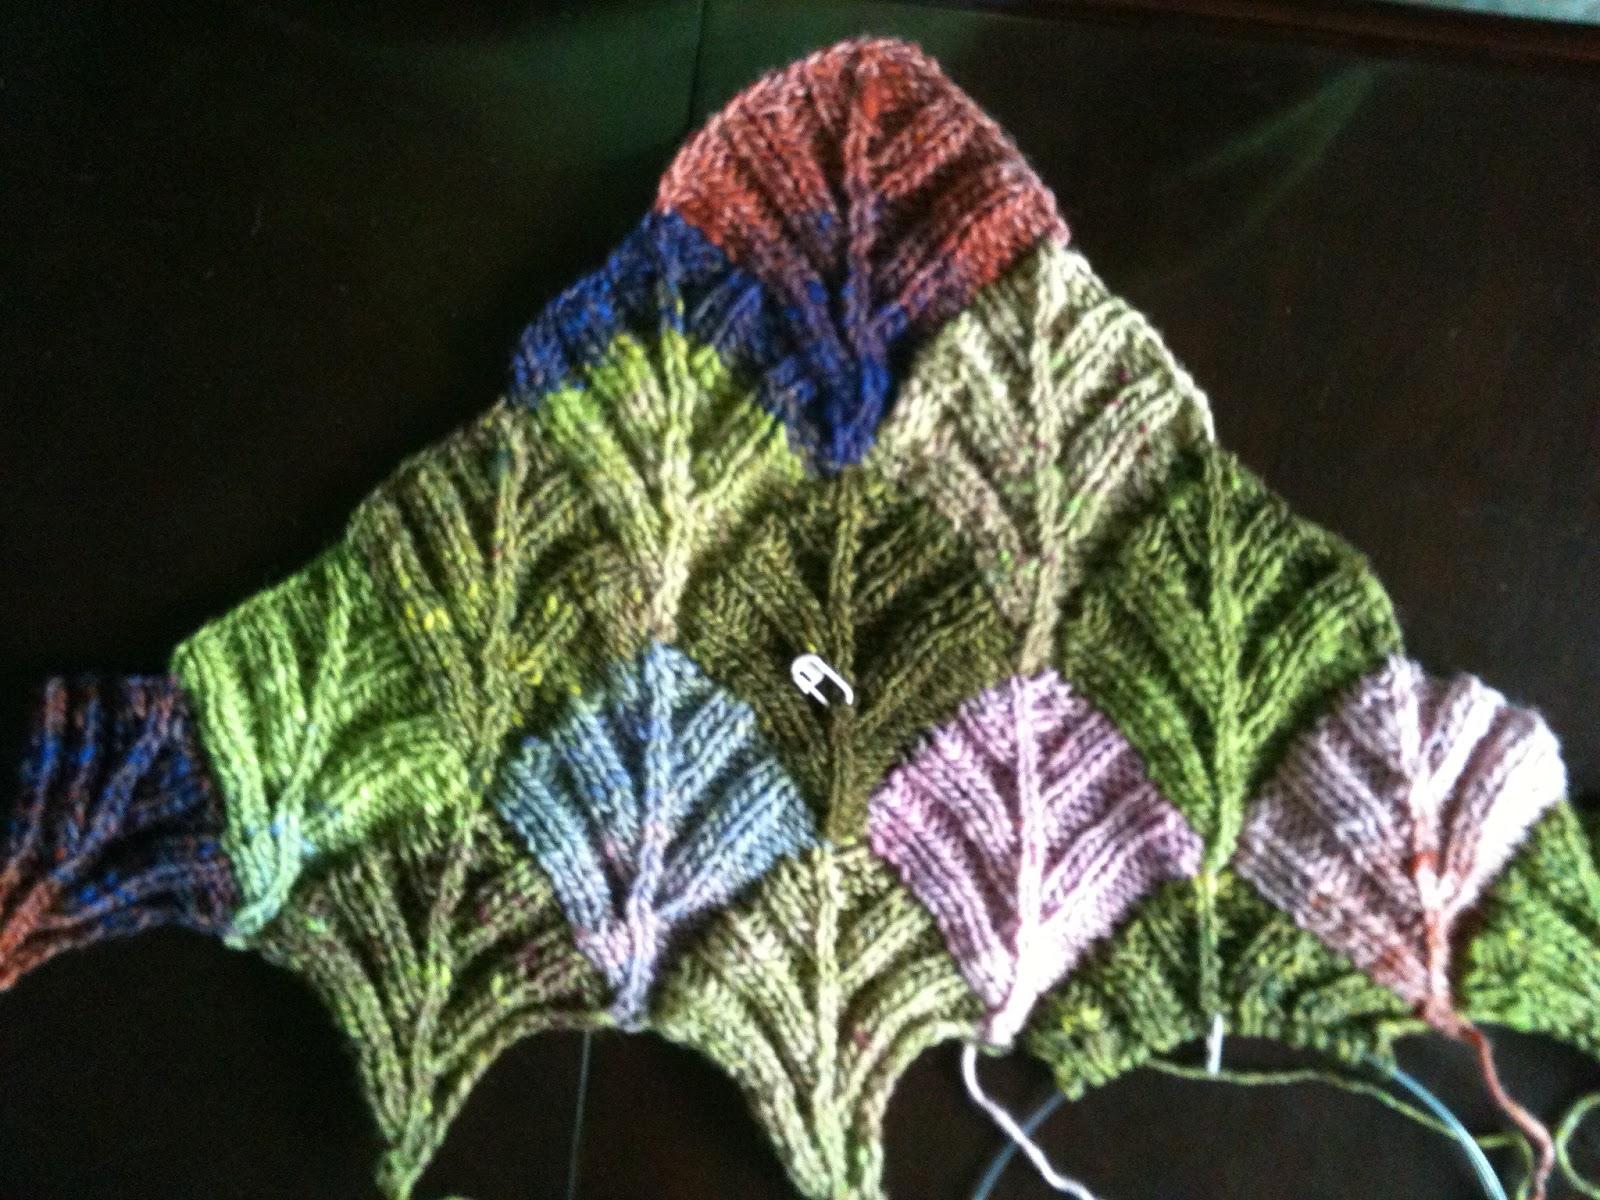 Modular Knitting Patterns : A New Logo & More Modular Knitting The Treadmill Knitter